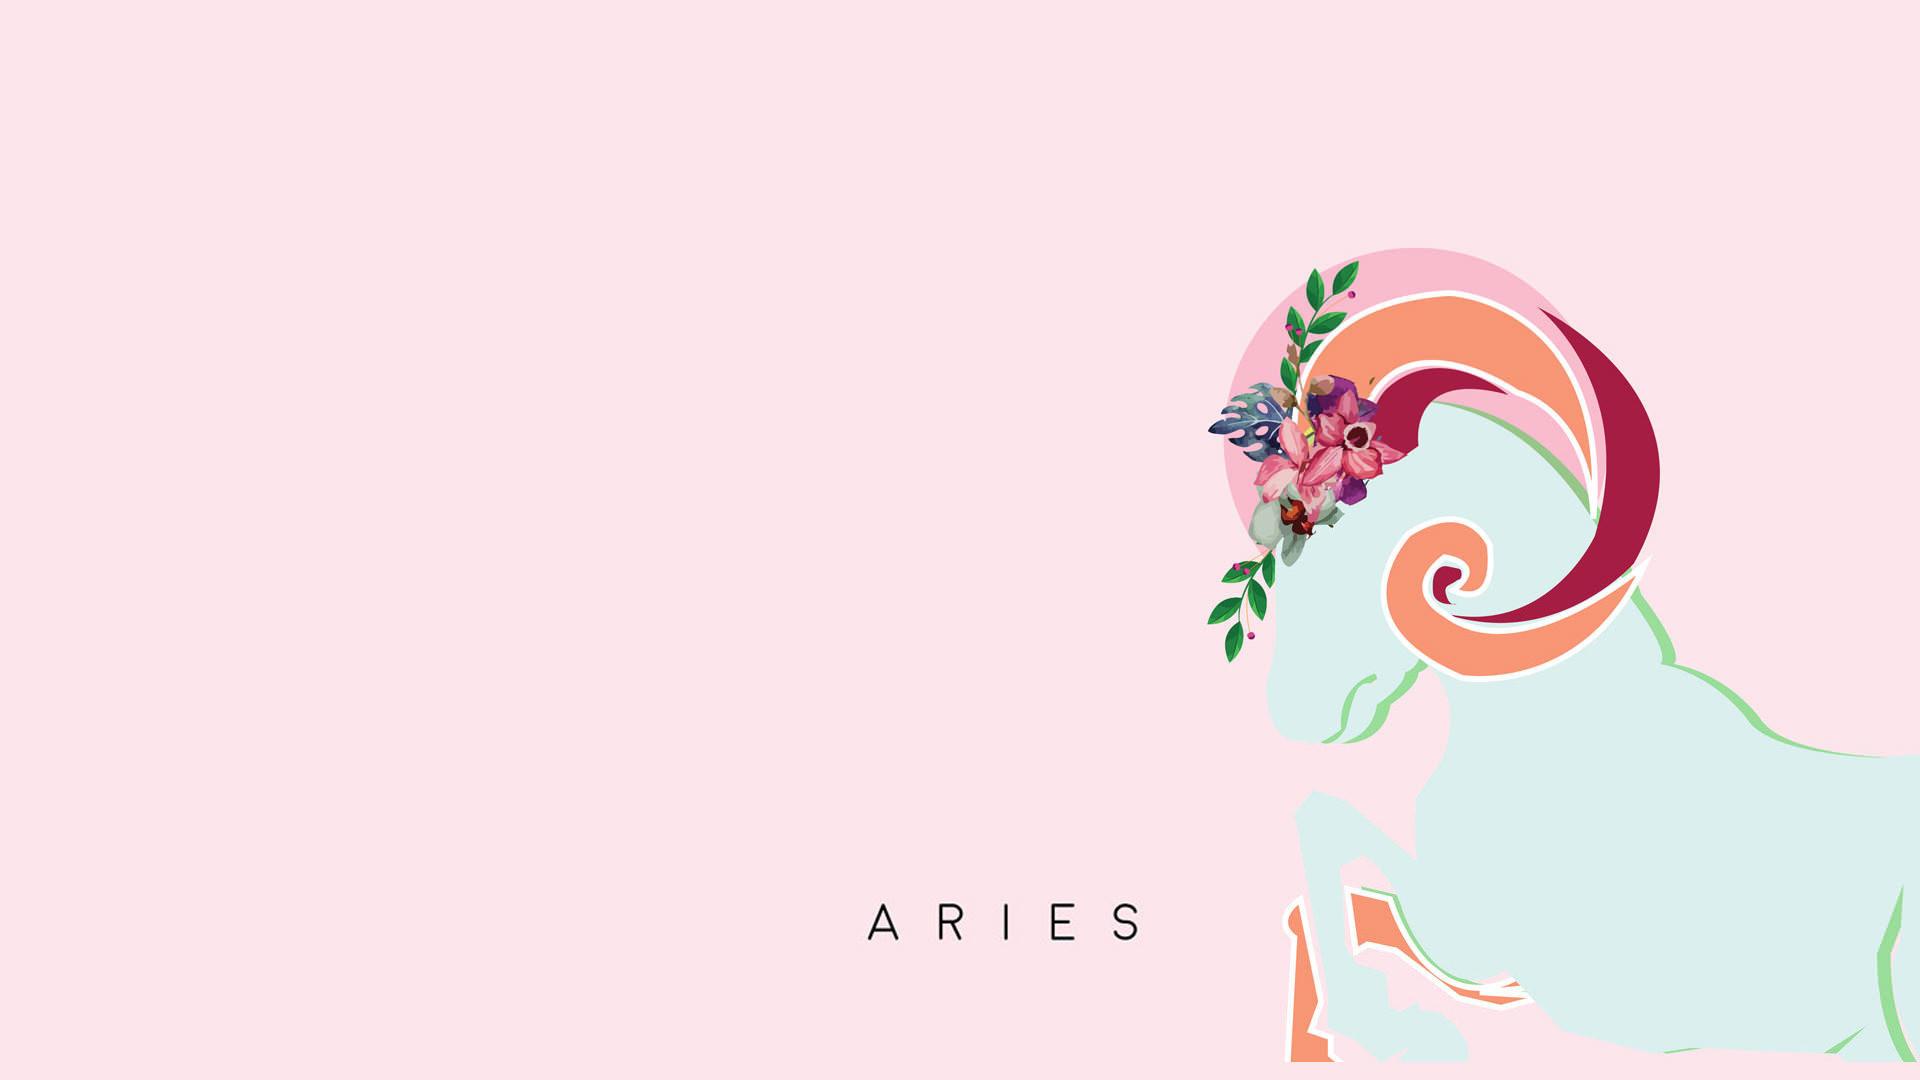 Wiki Aries Desktop Background Pic Wpc0011601 - Aries Wallpaper Aesthetic Laptop - HD Wallpaper